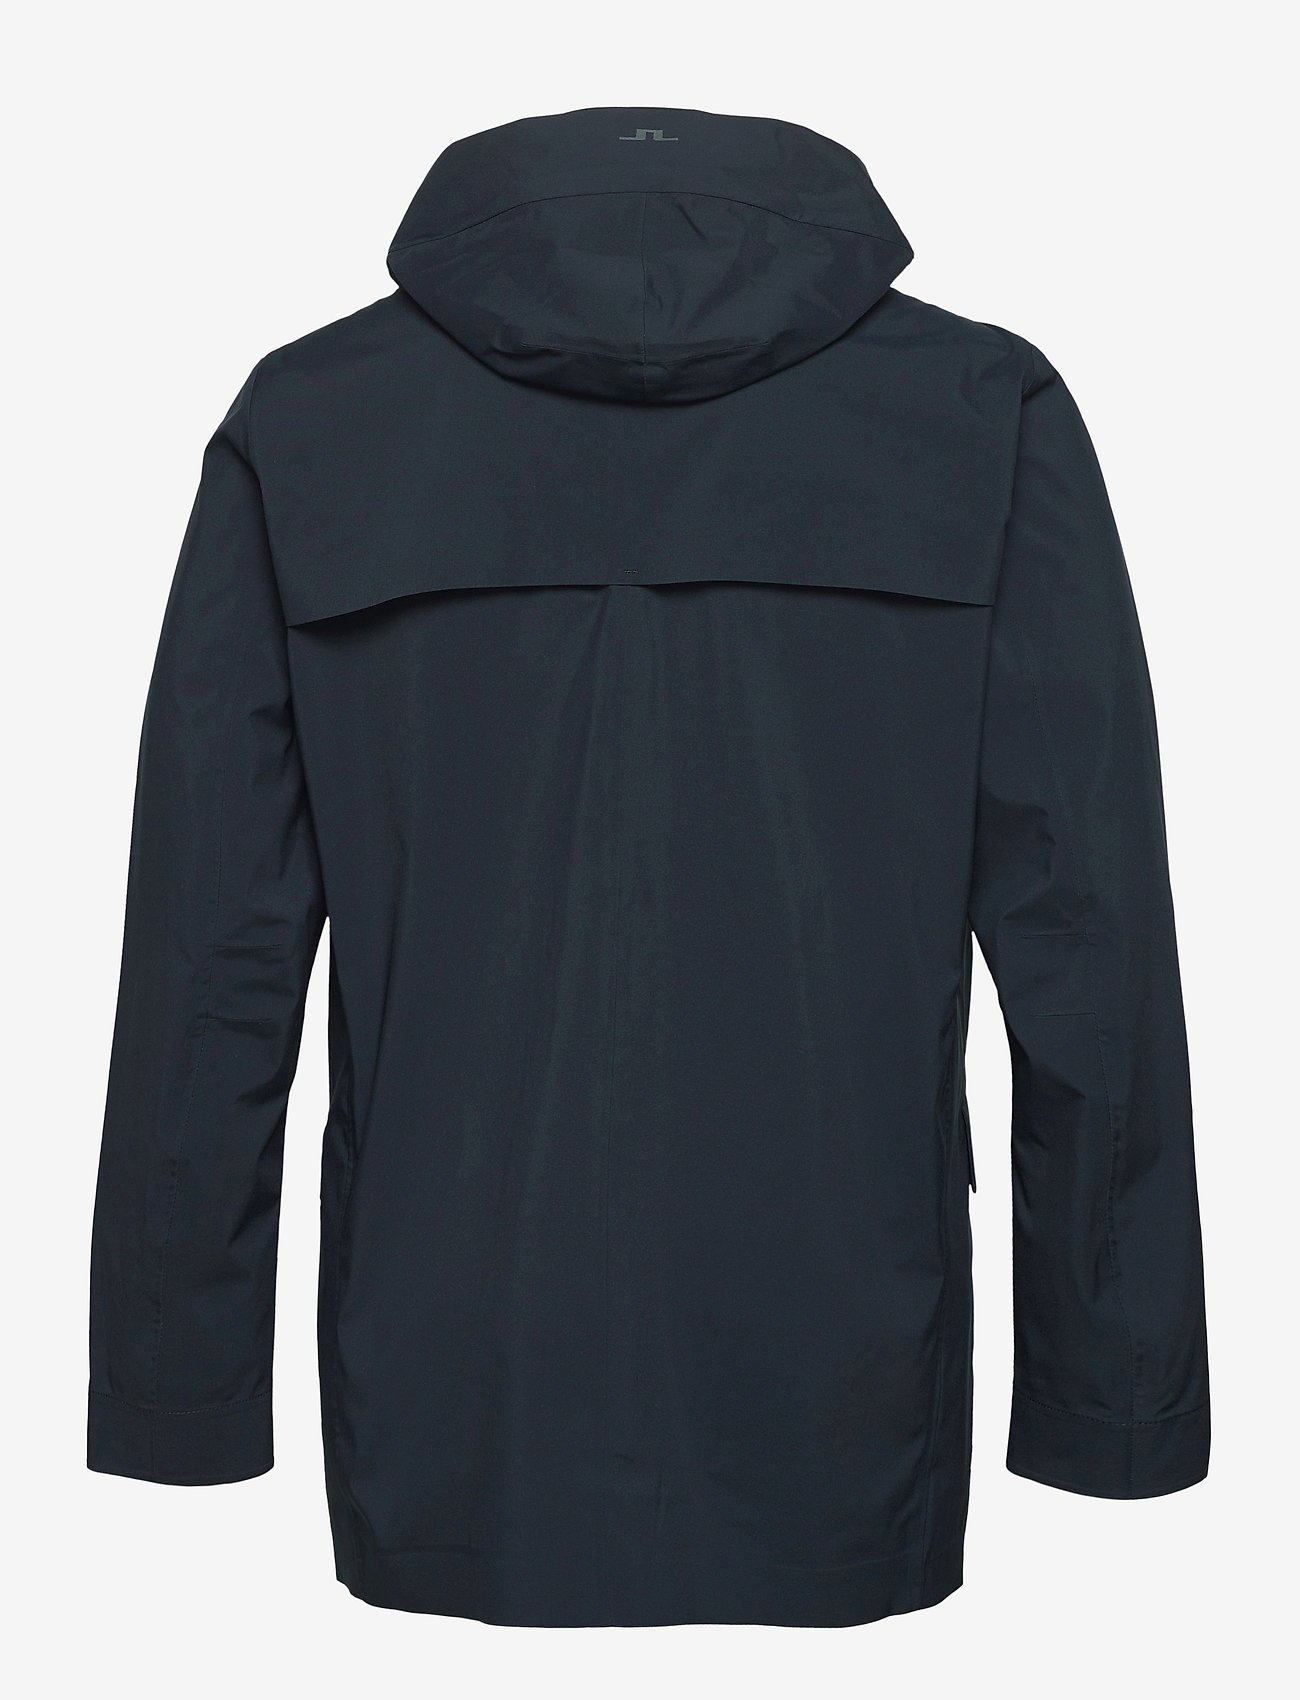 J. Lindeberg - Alph Mech Stretch jacket - leichte jacken - jl navy - 1